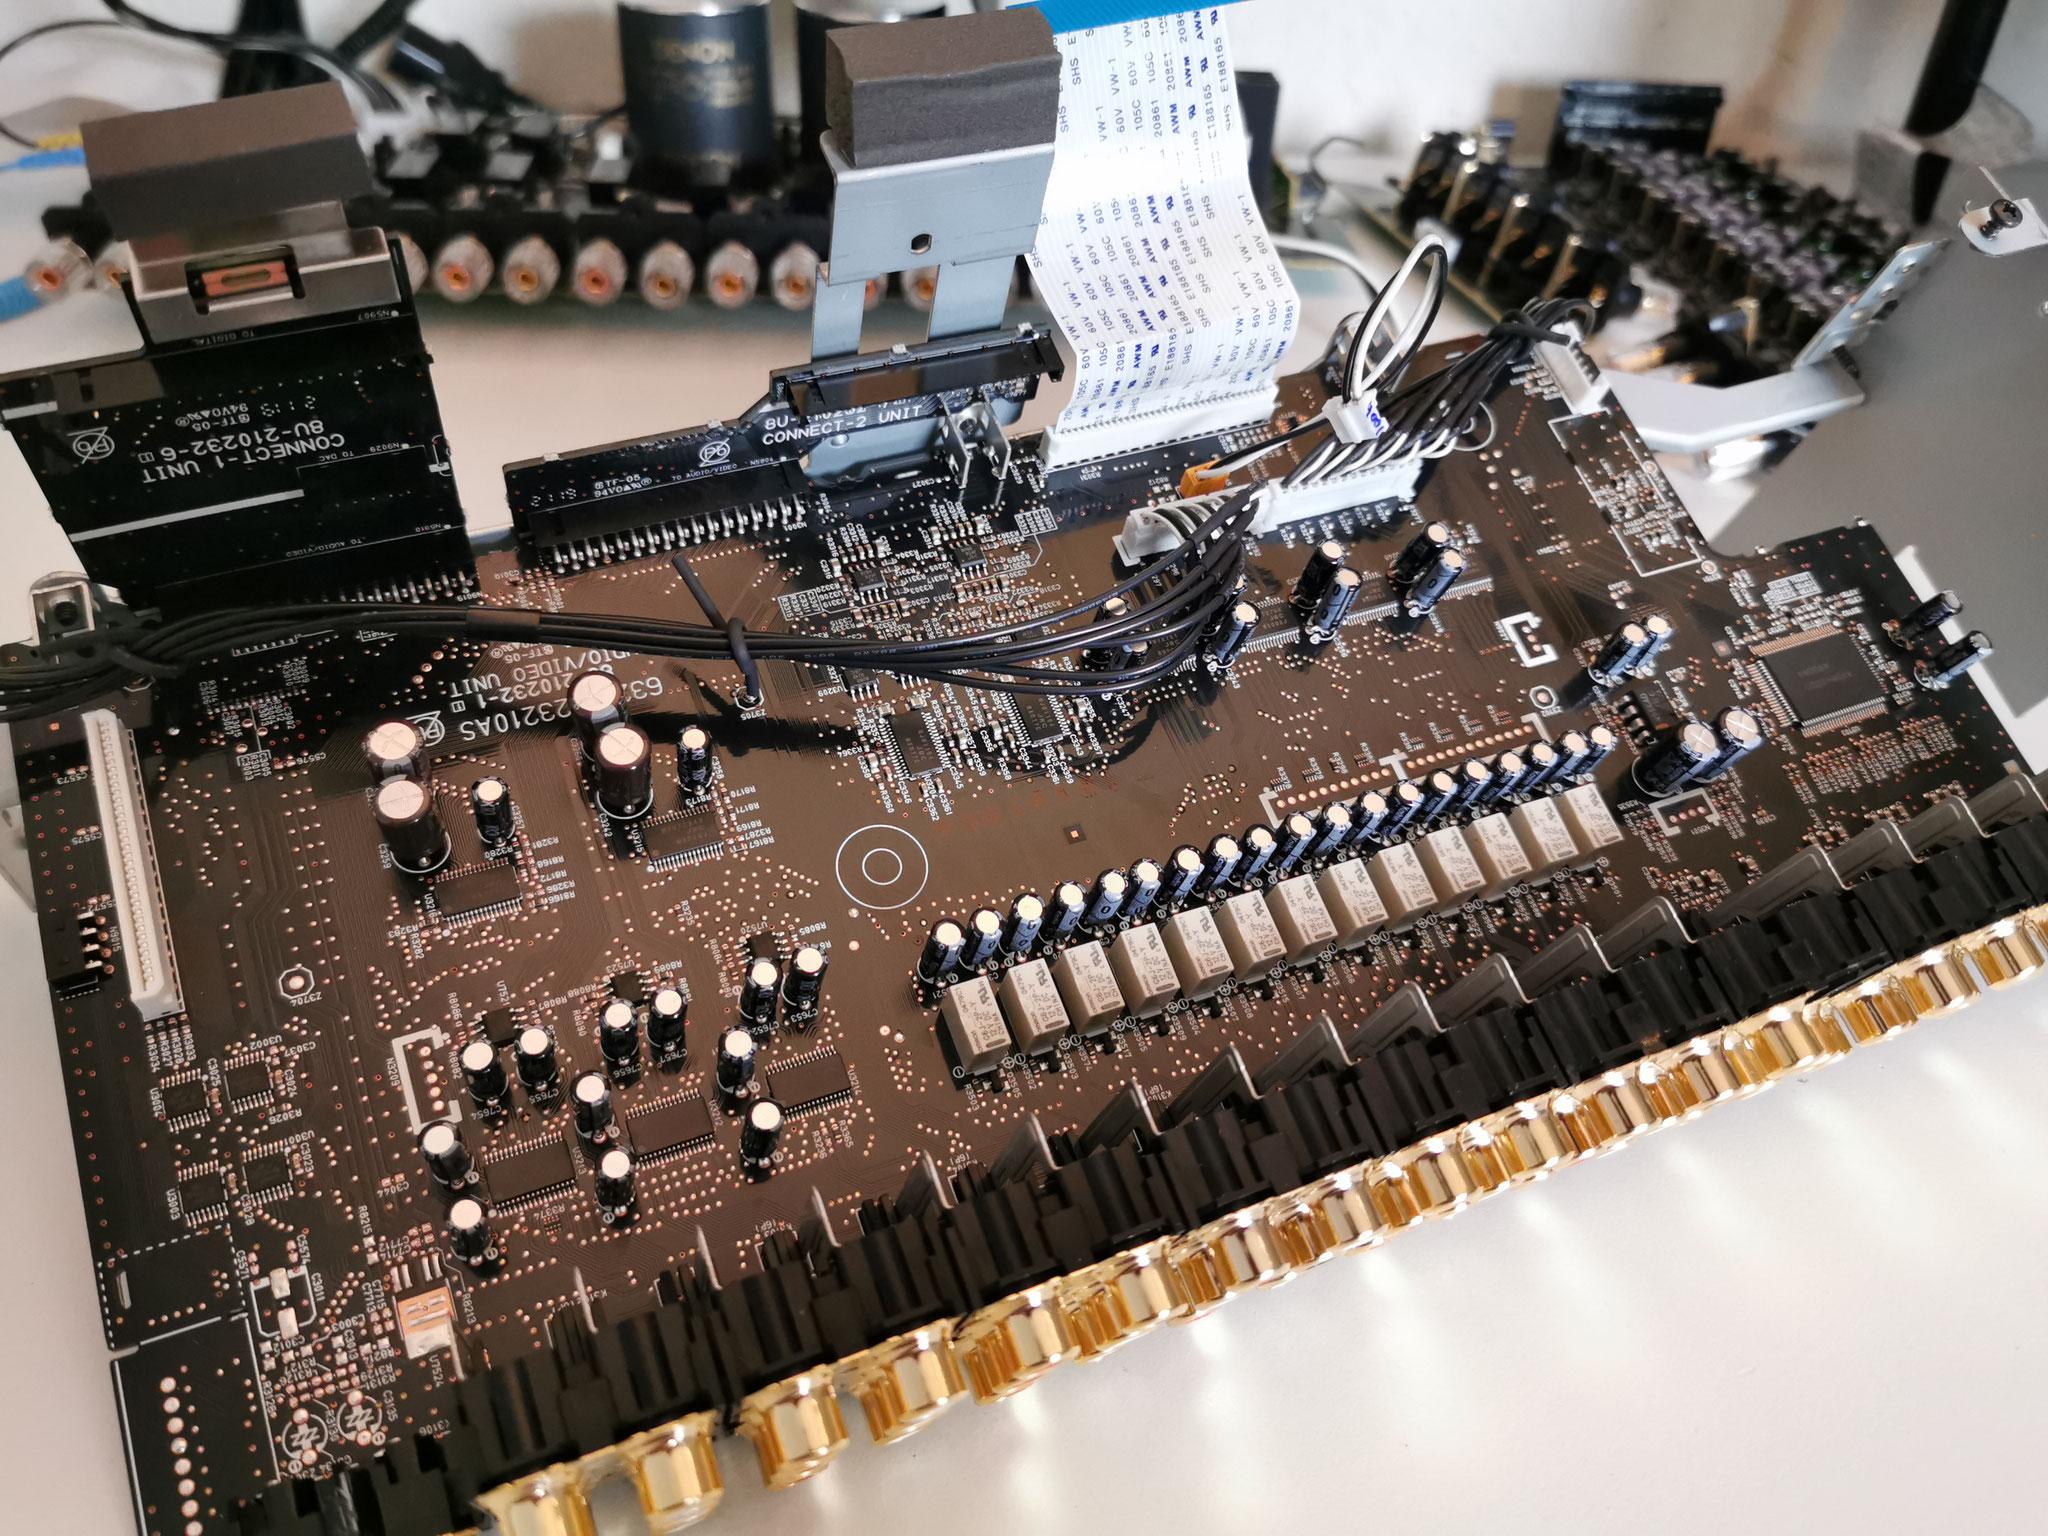 Denon AVC-X8500H Input Output Board